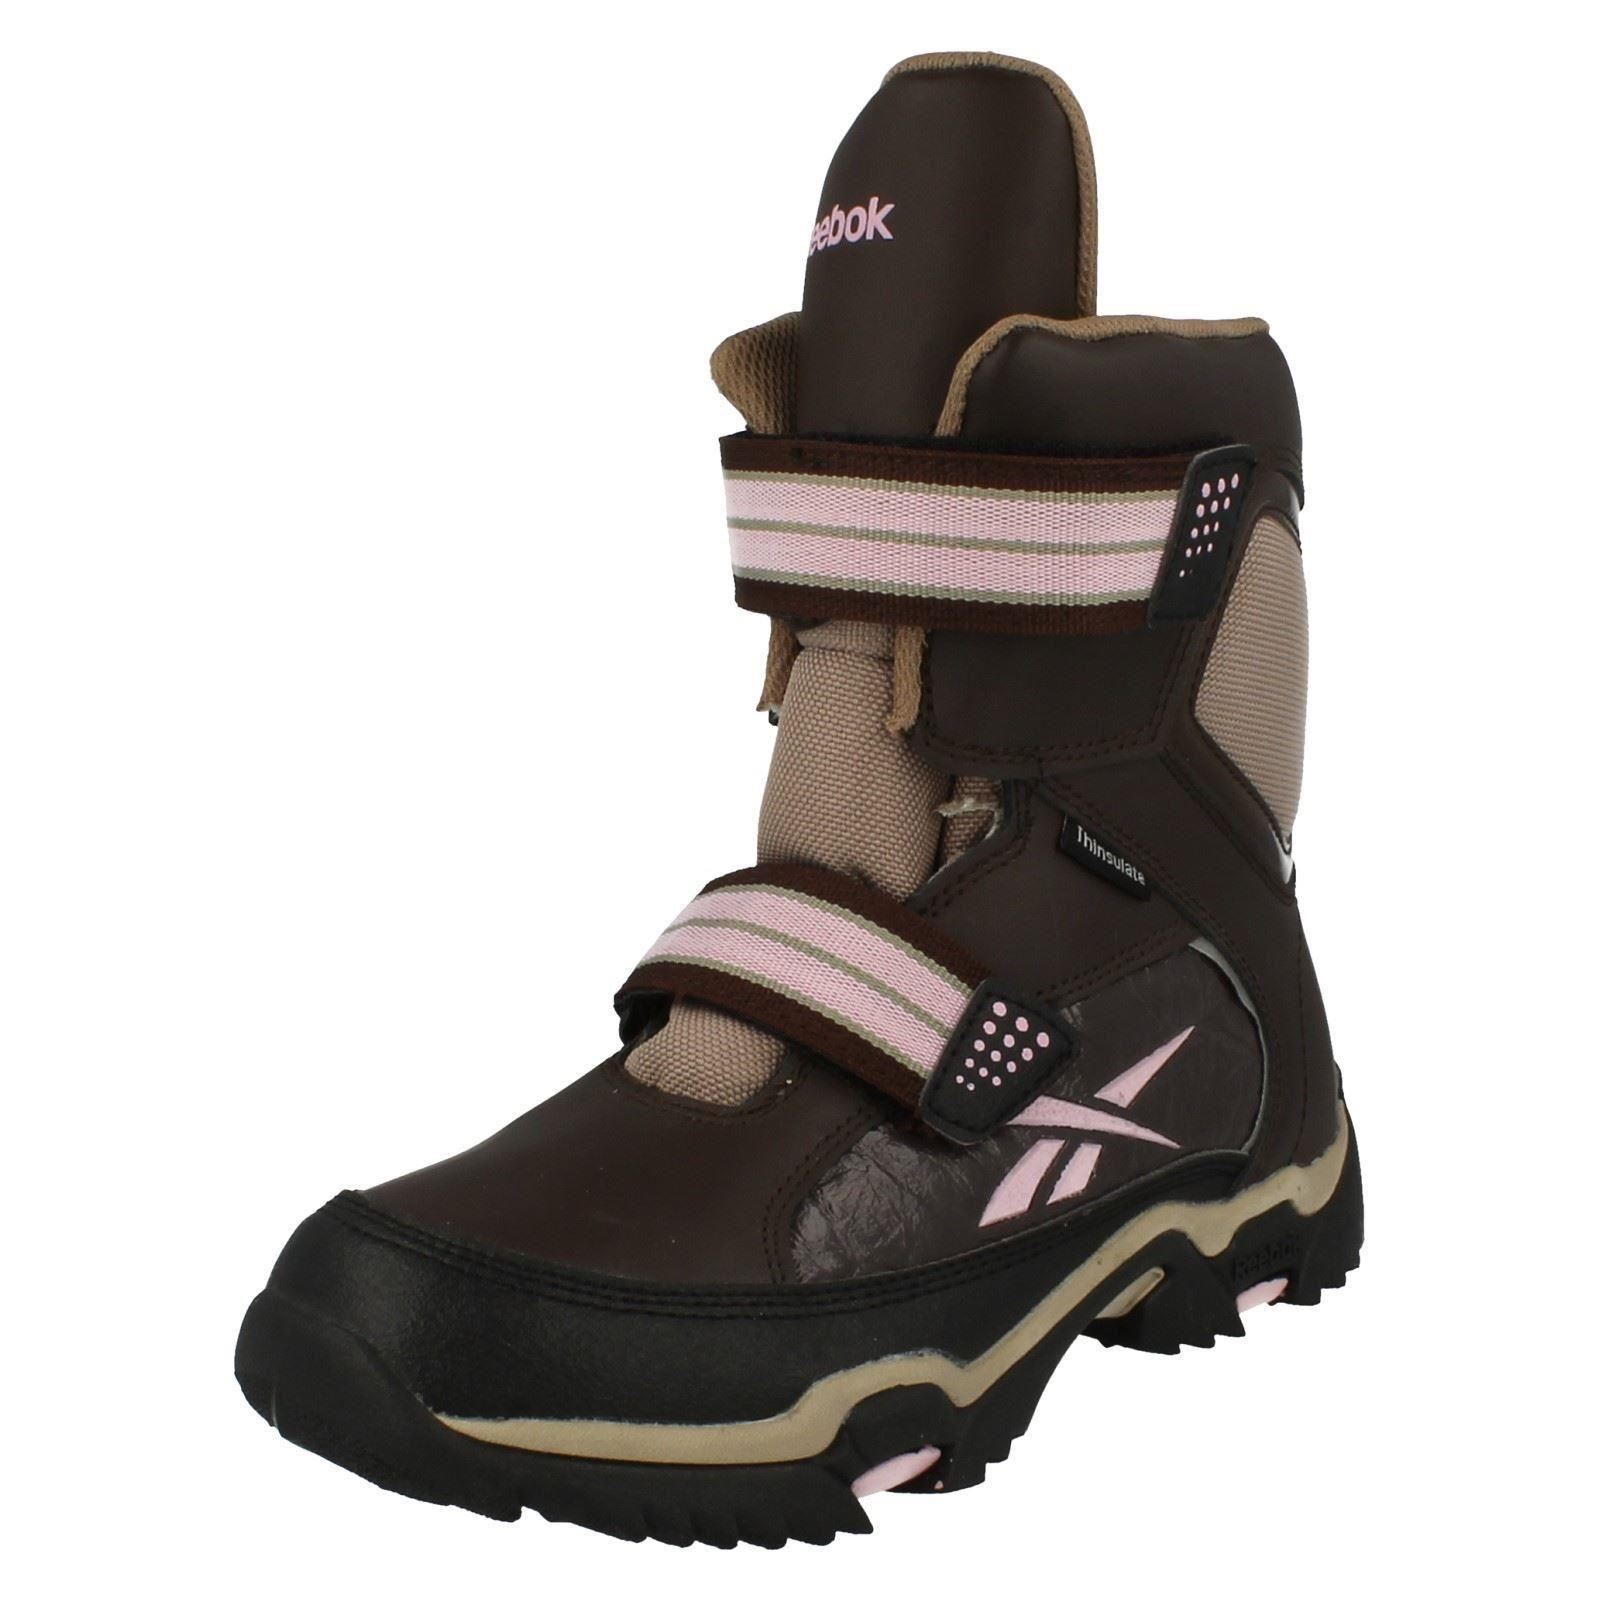 Ladies Reebok Strap Snow Boots Canyon Aro   eBay